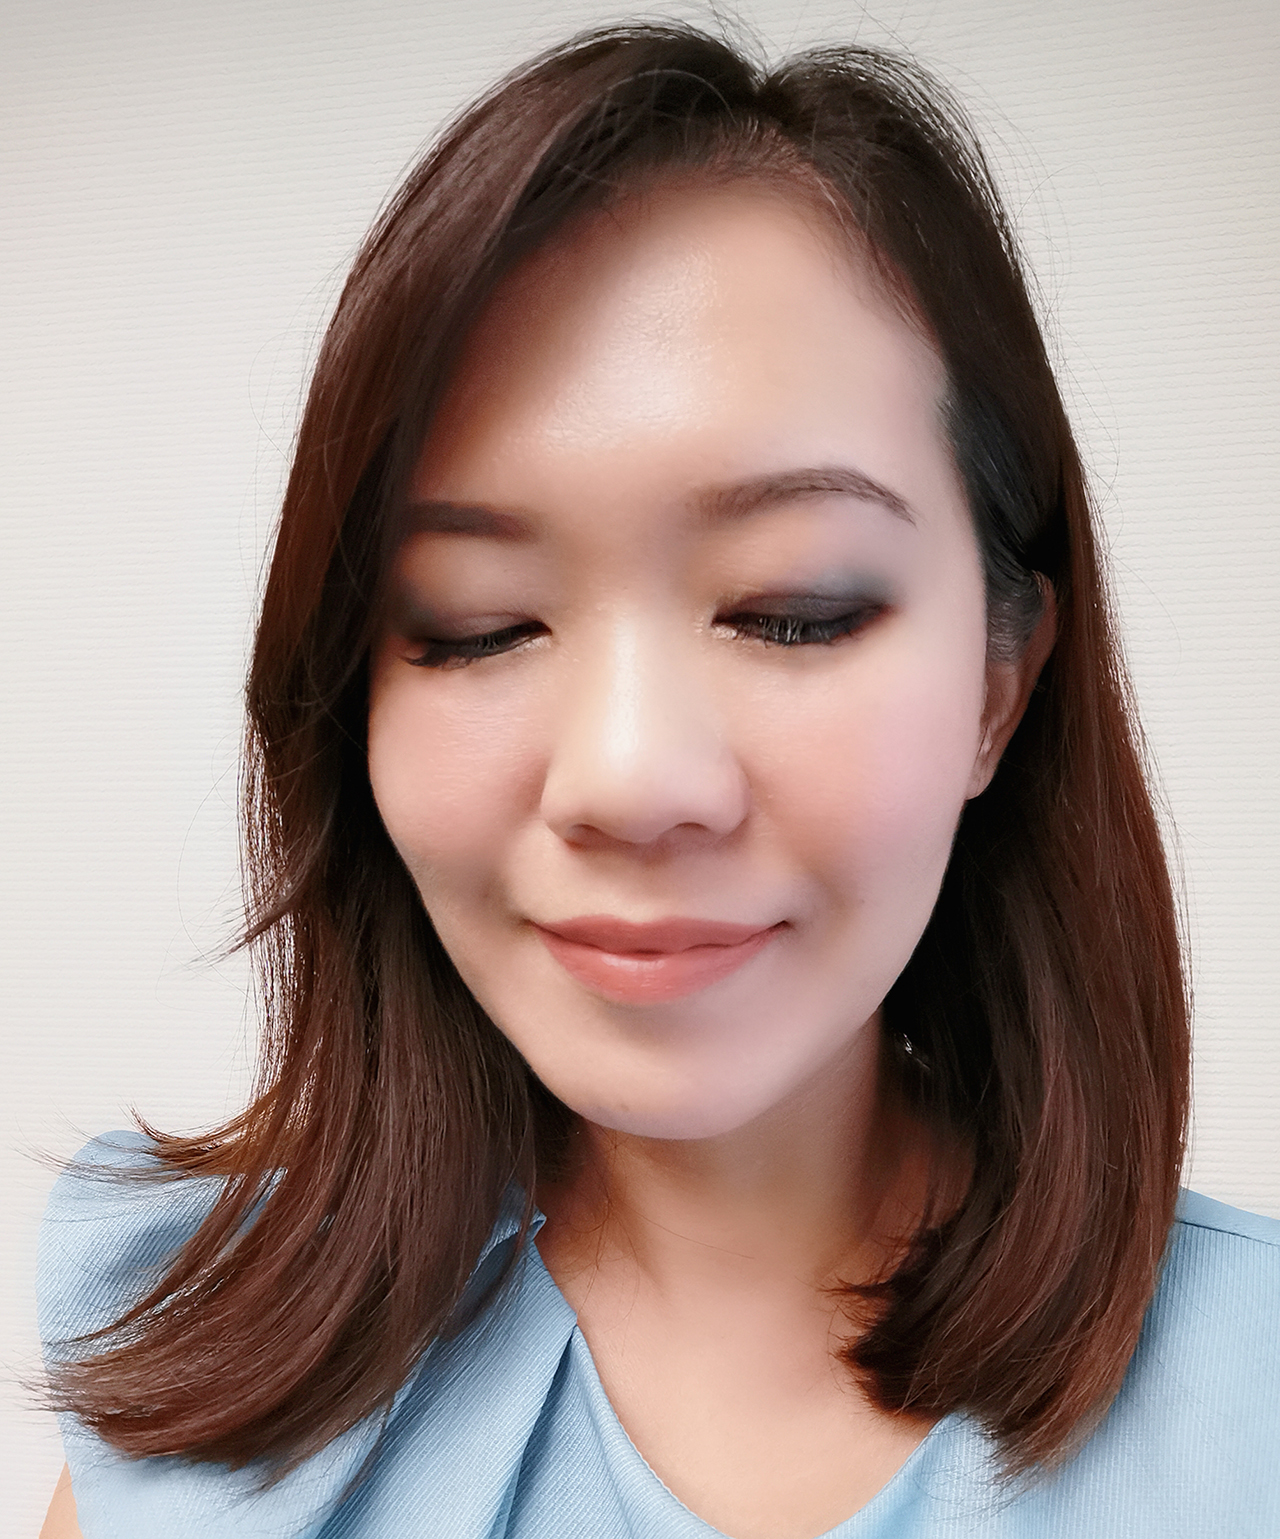 Chanel Spring 2019 makeup look 1